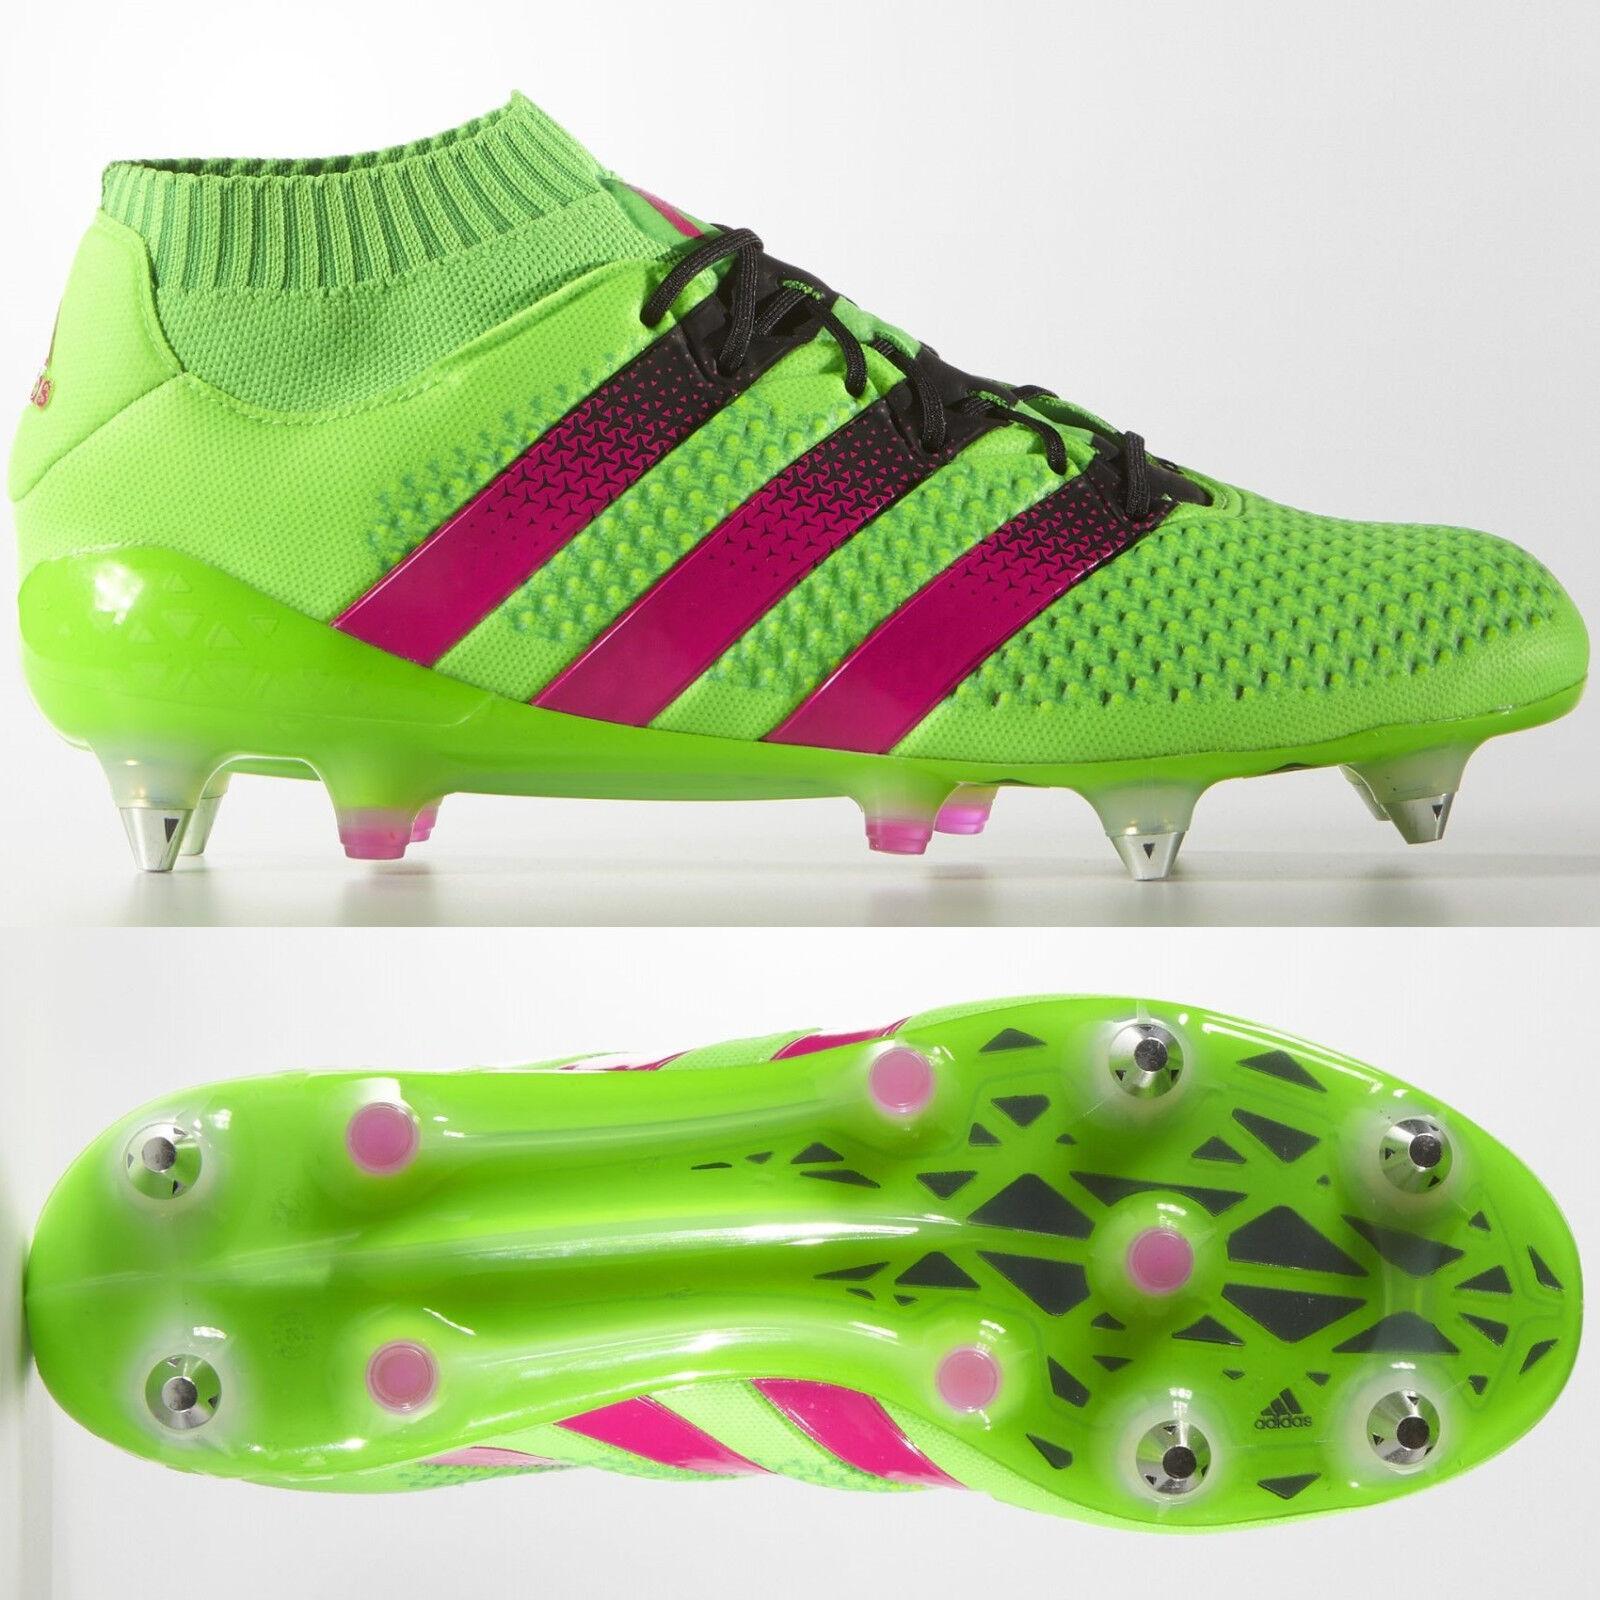 Adidas ACE 16.1 Primeknit SG para Hombre botas De Fútbol verde terreno blando  RRP